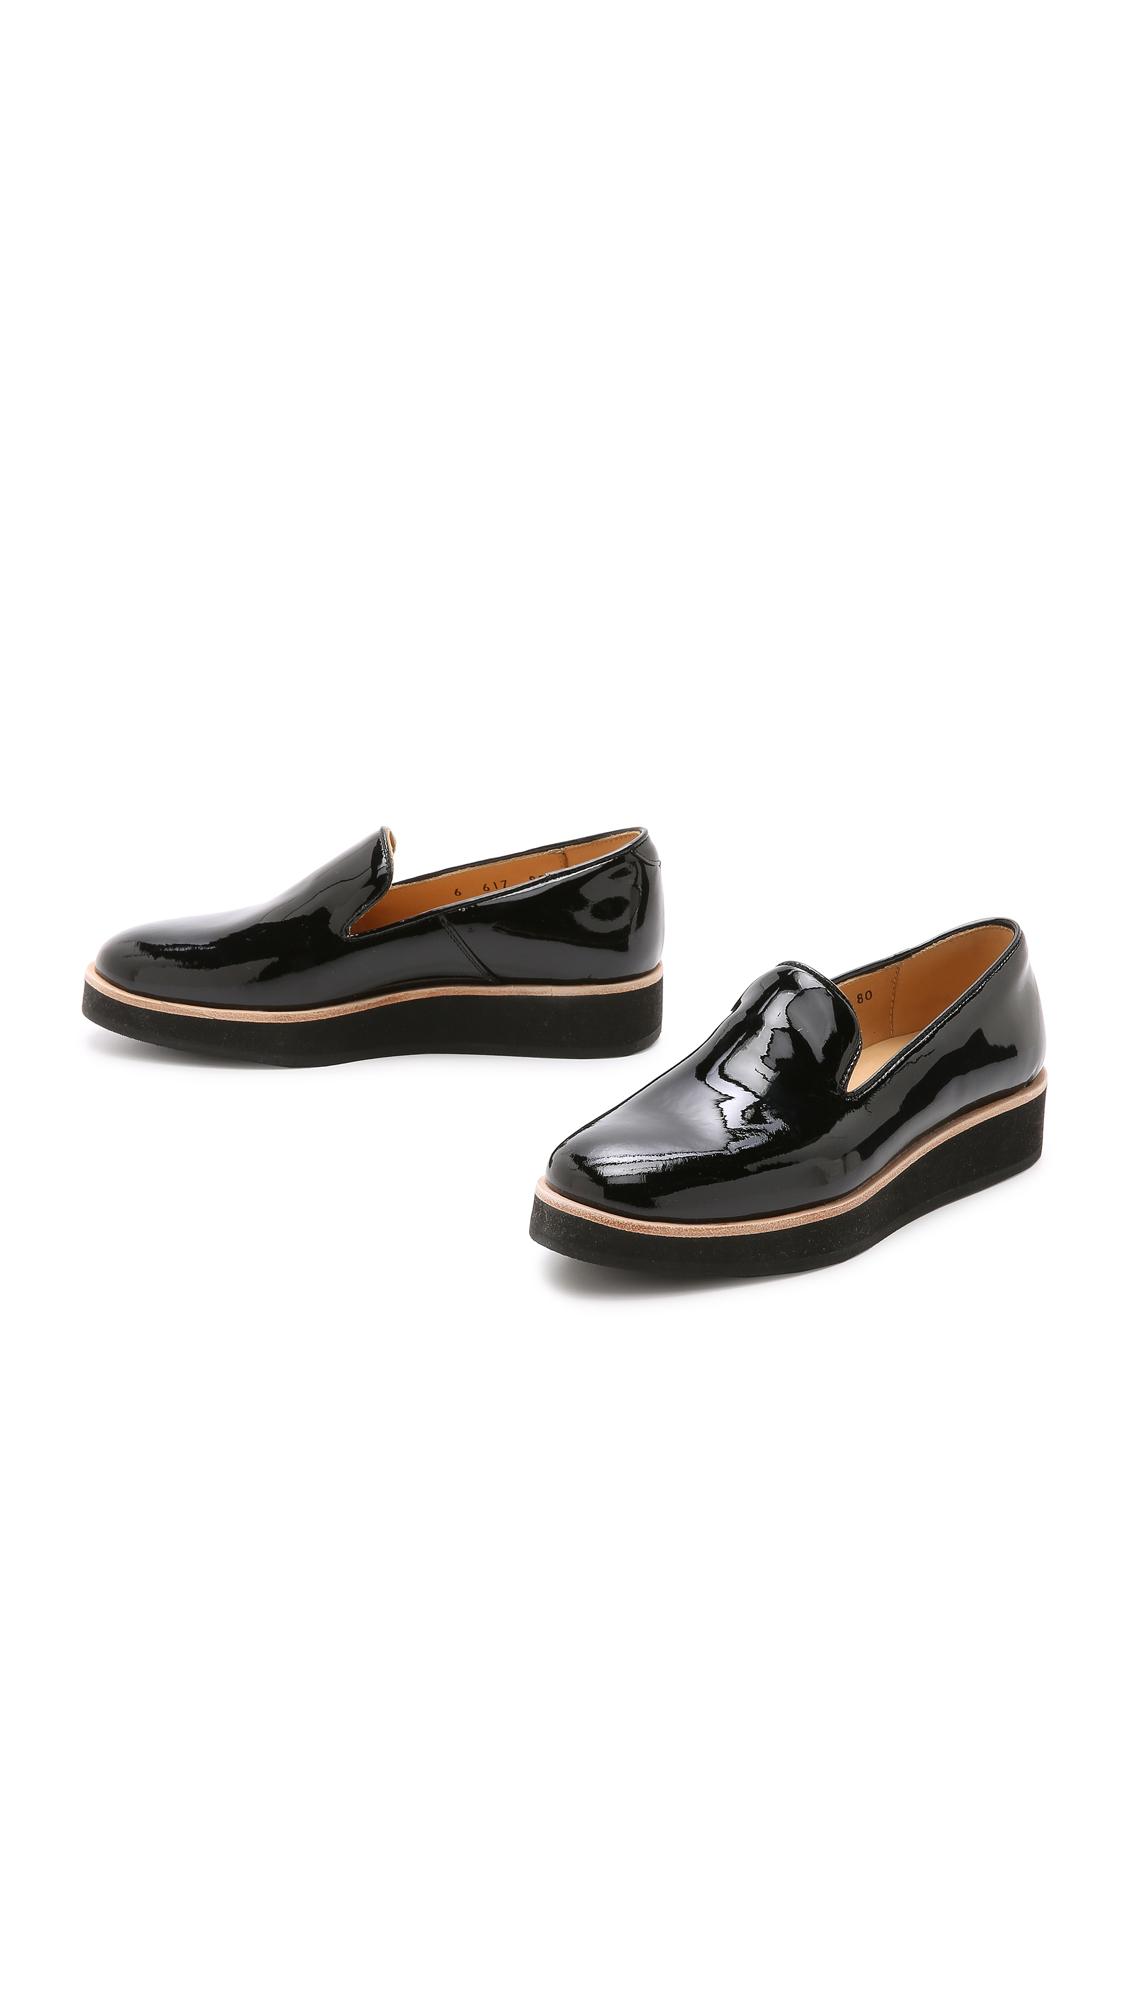 Dieppa Restrepo Mens Shoes